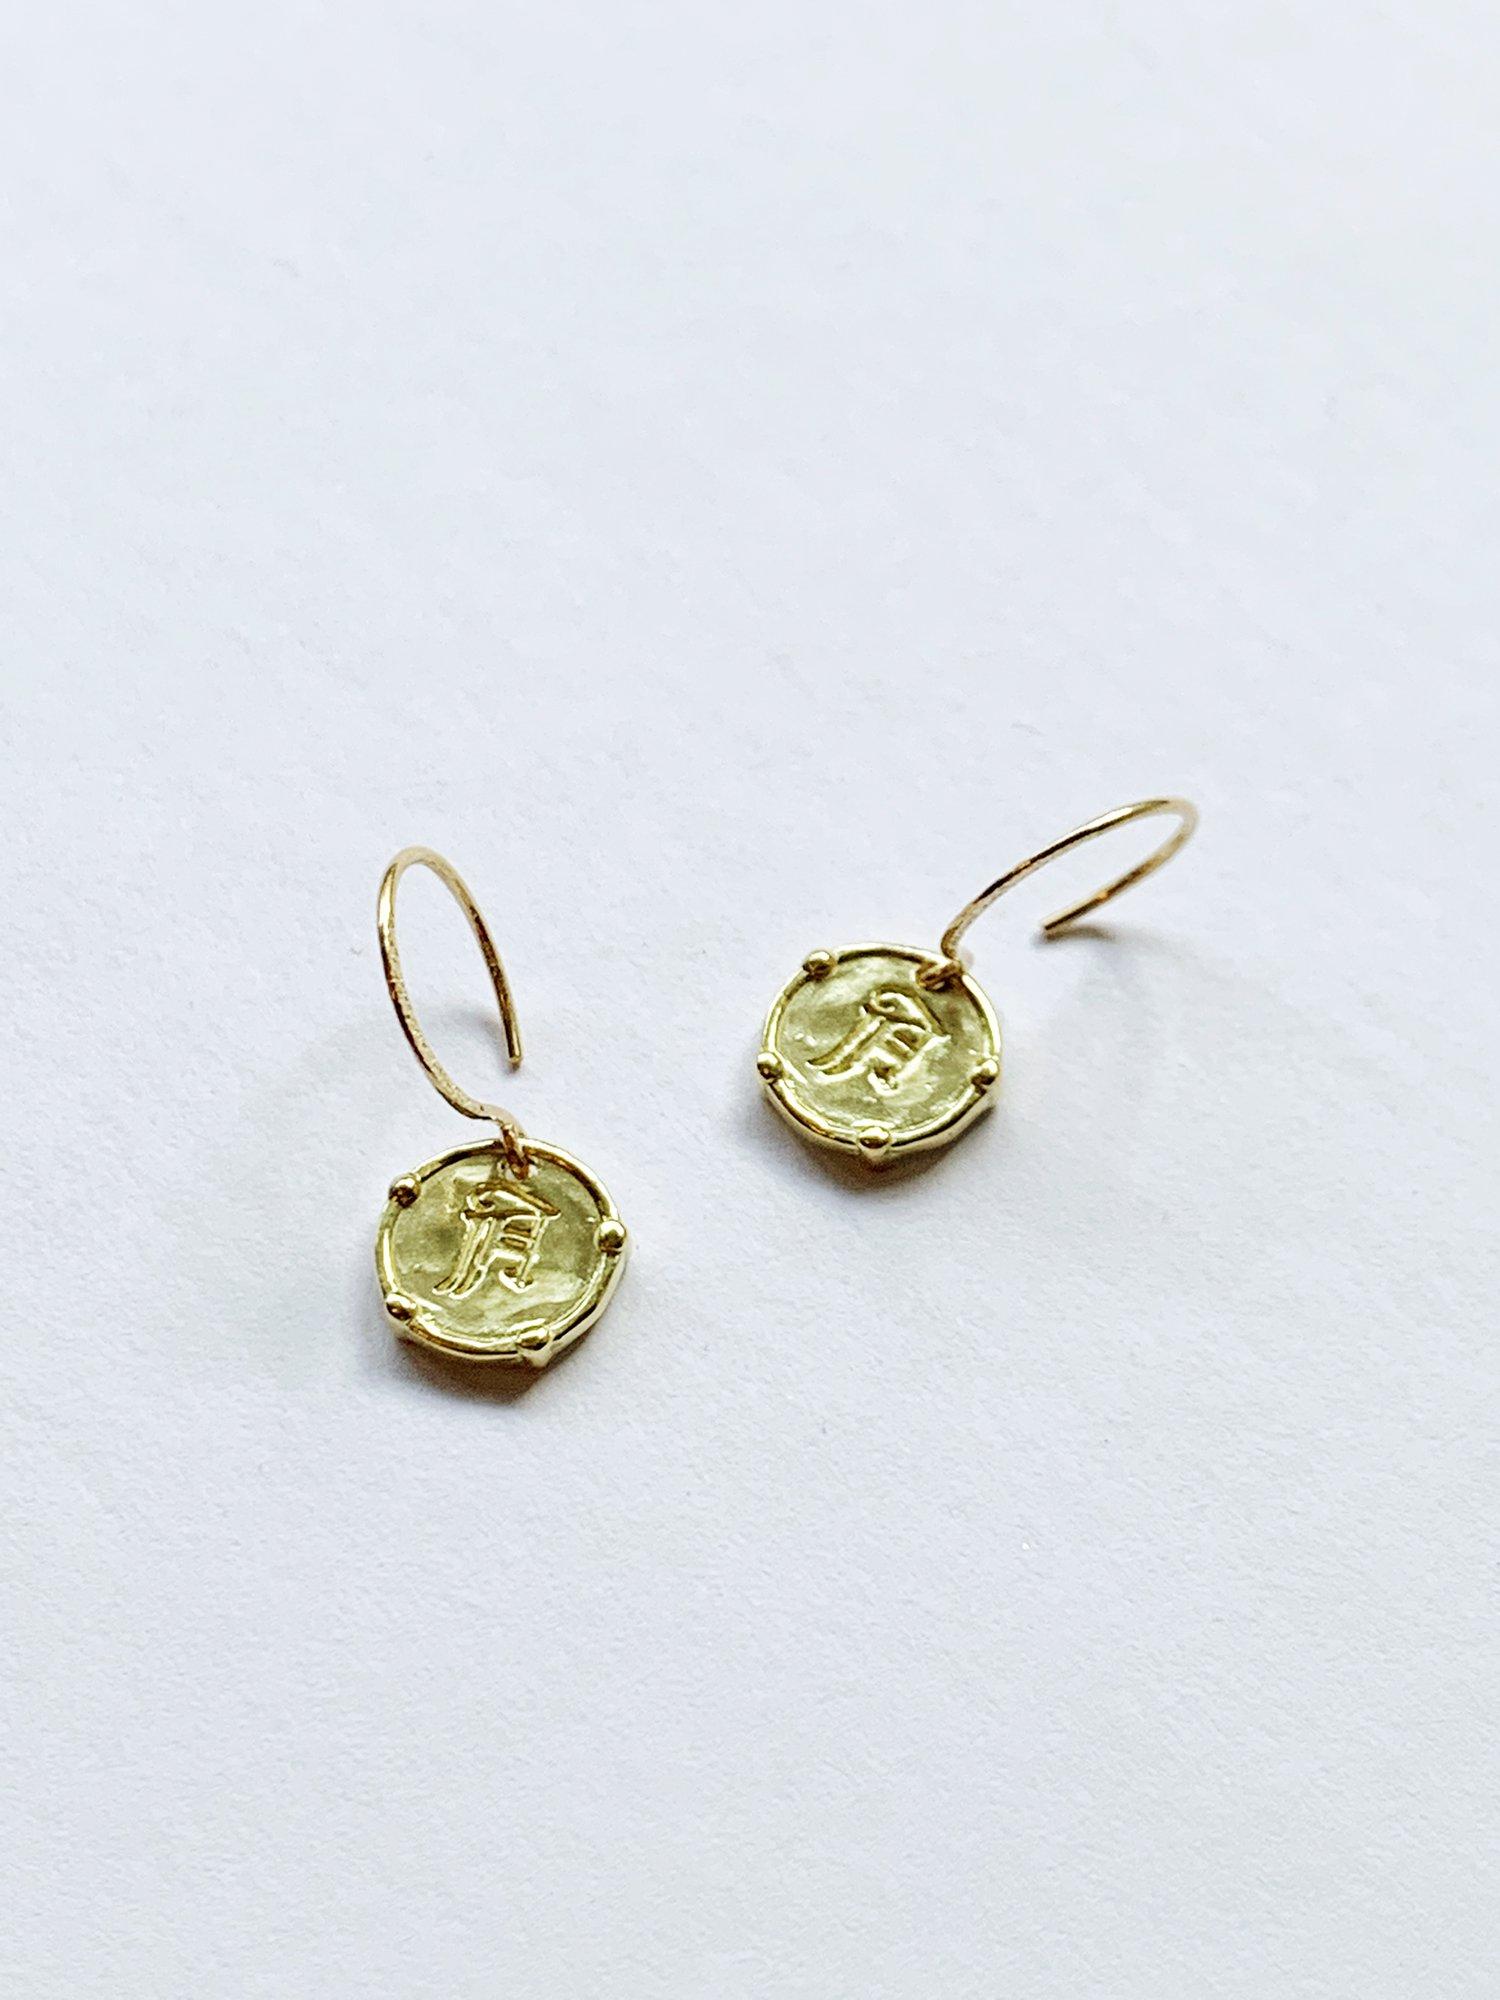 HELIOS / Blackletter coin earrings